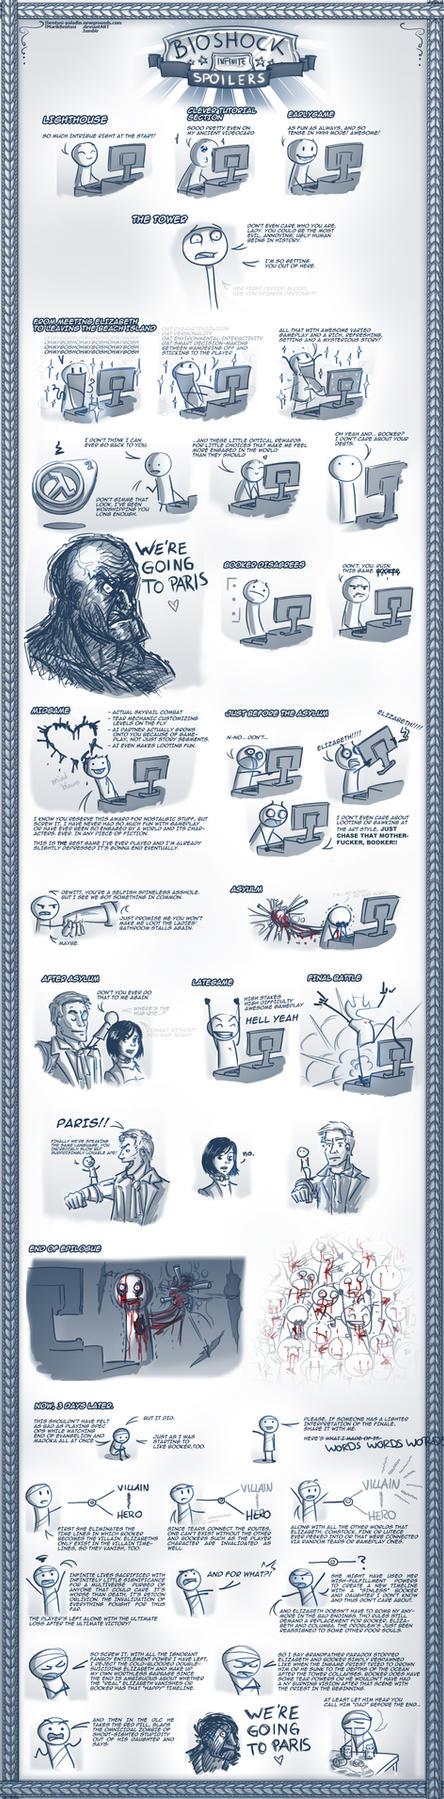 Bioshock Infinite Retrospect (SPOILERS) by MarikBentusi